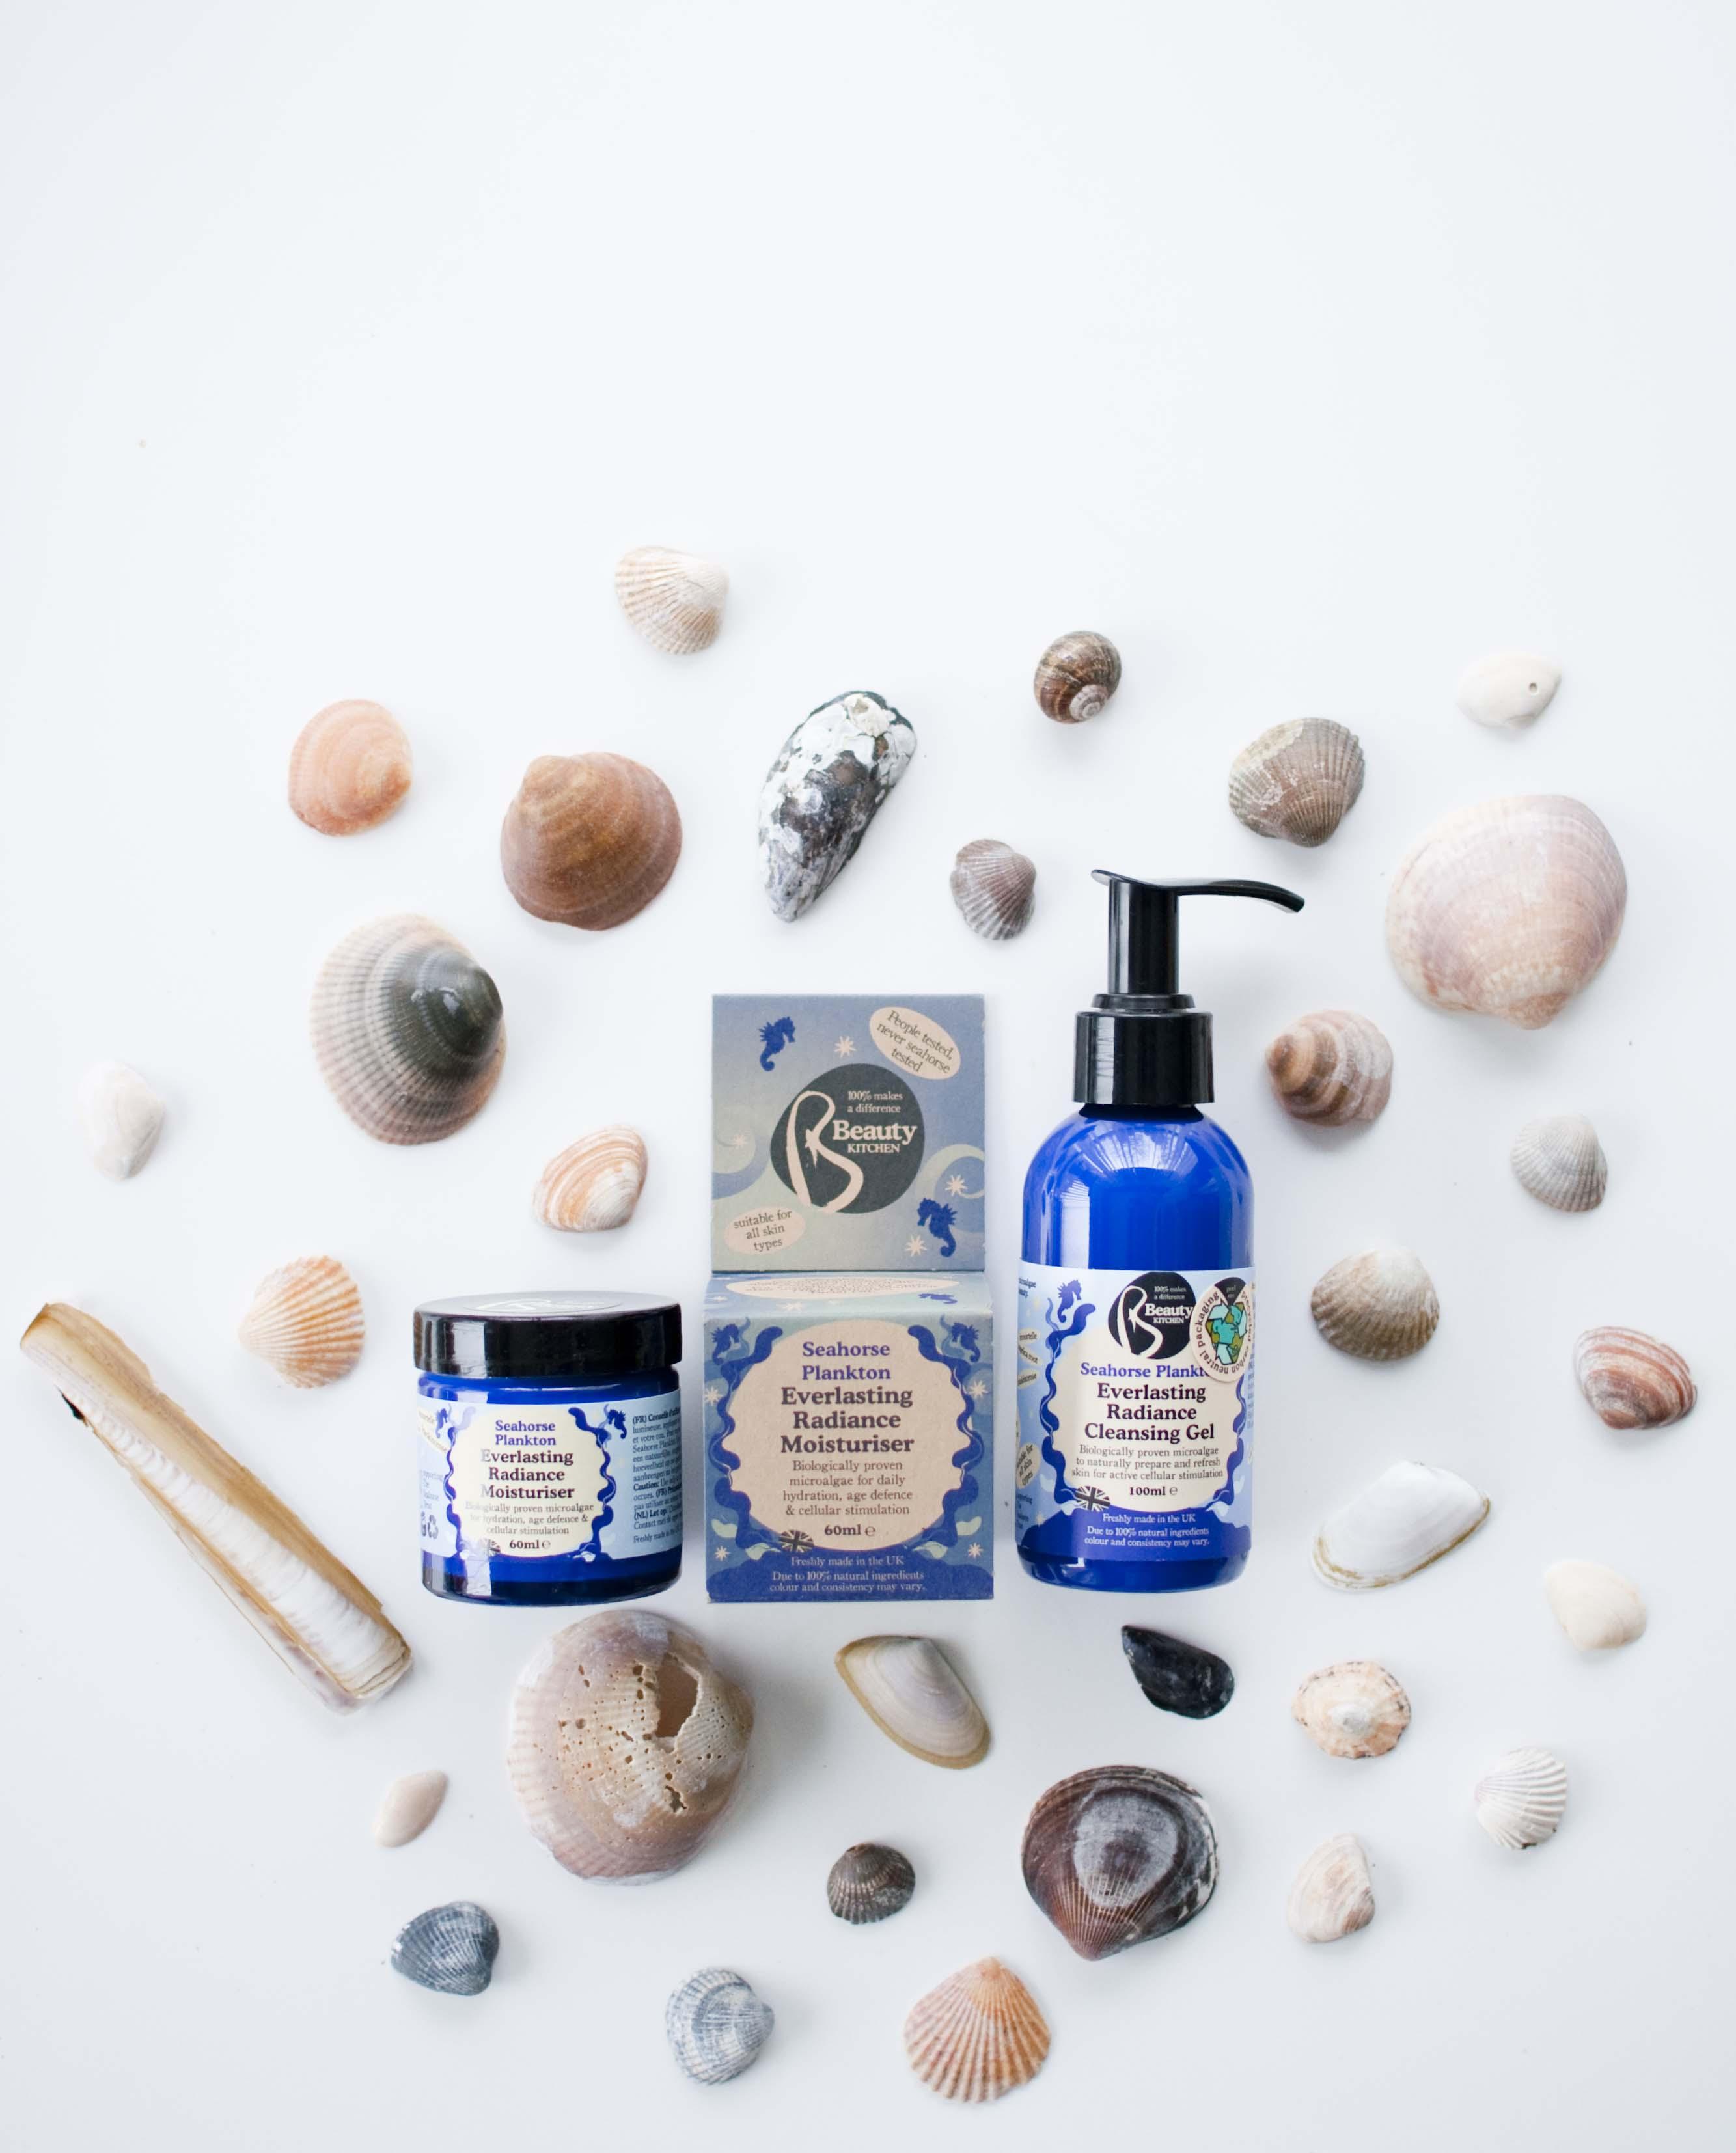 review beauty kitchen seahorse plankton cleansing moisturiser